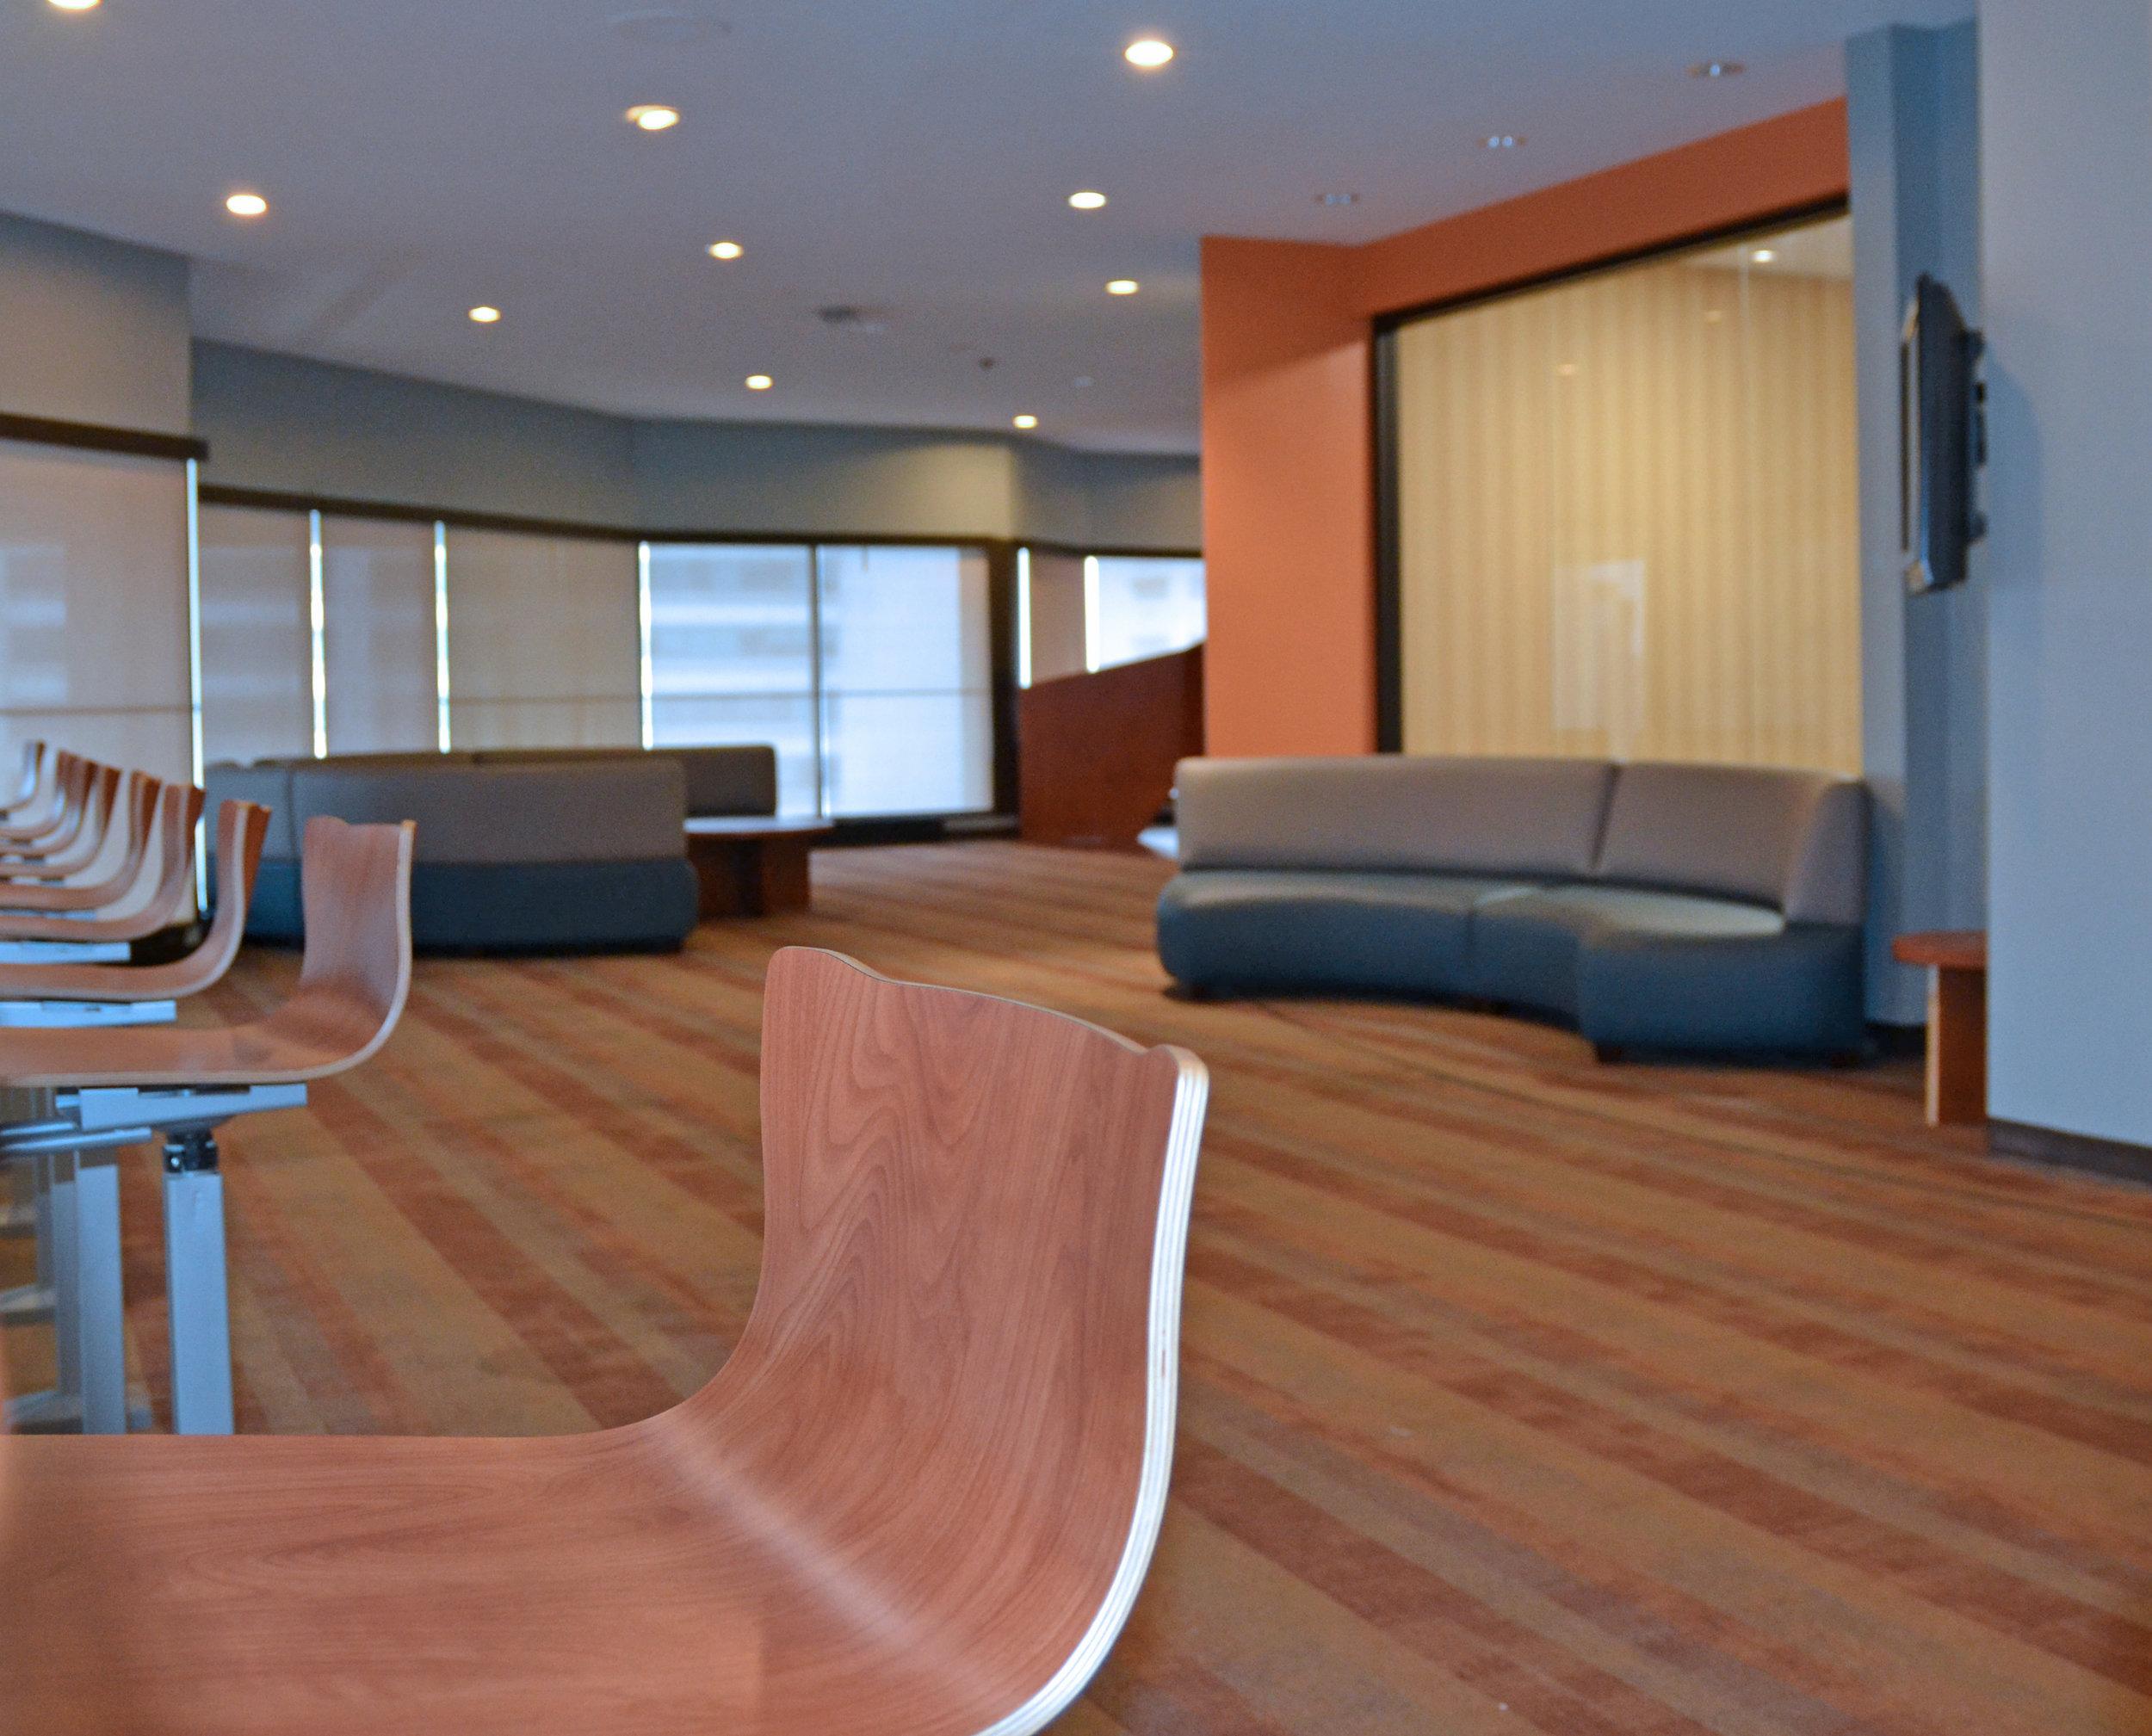 27th Floor Lounge.jpg